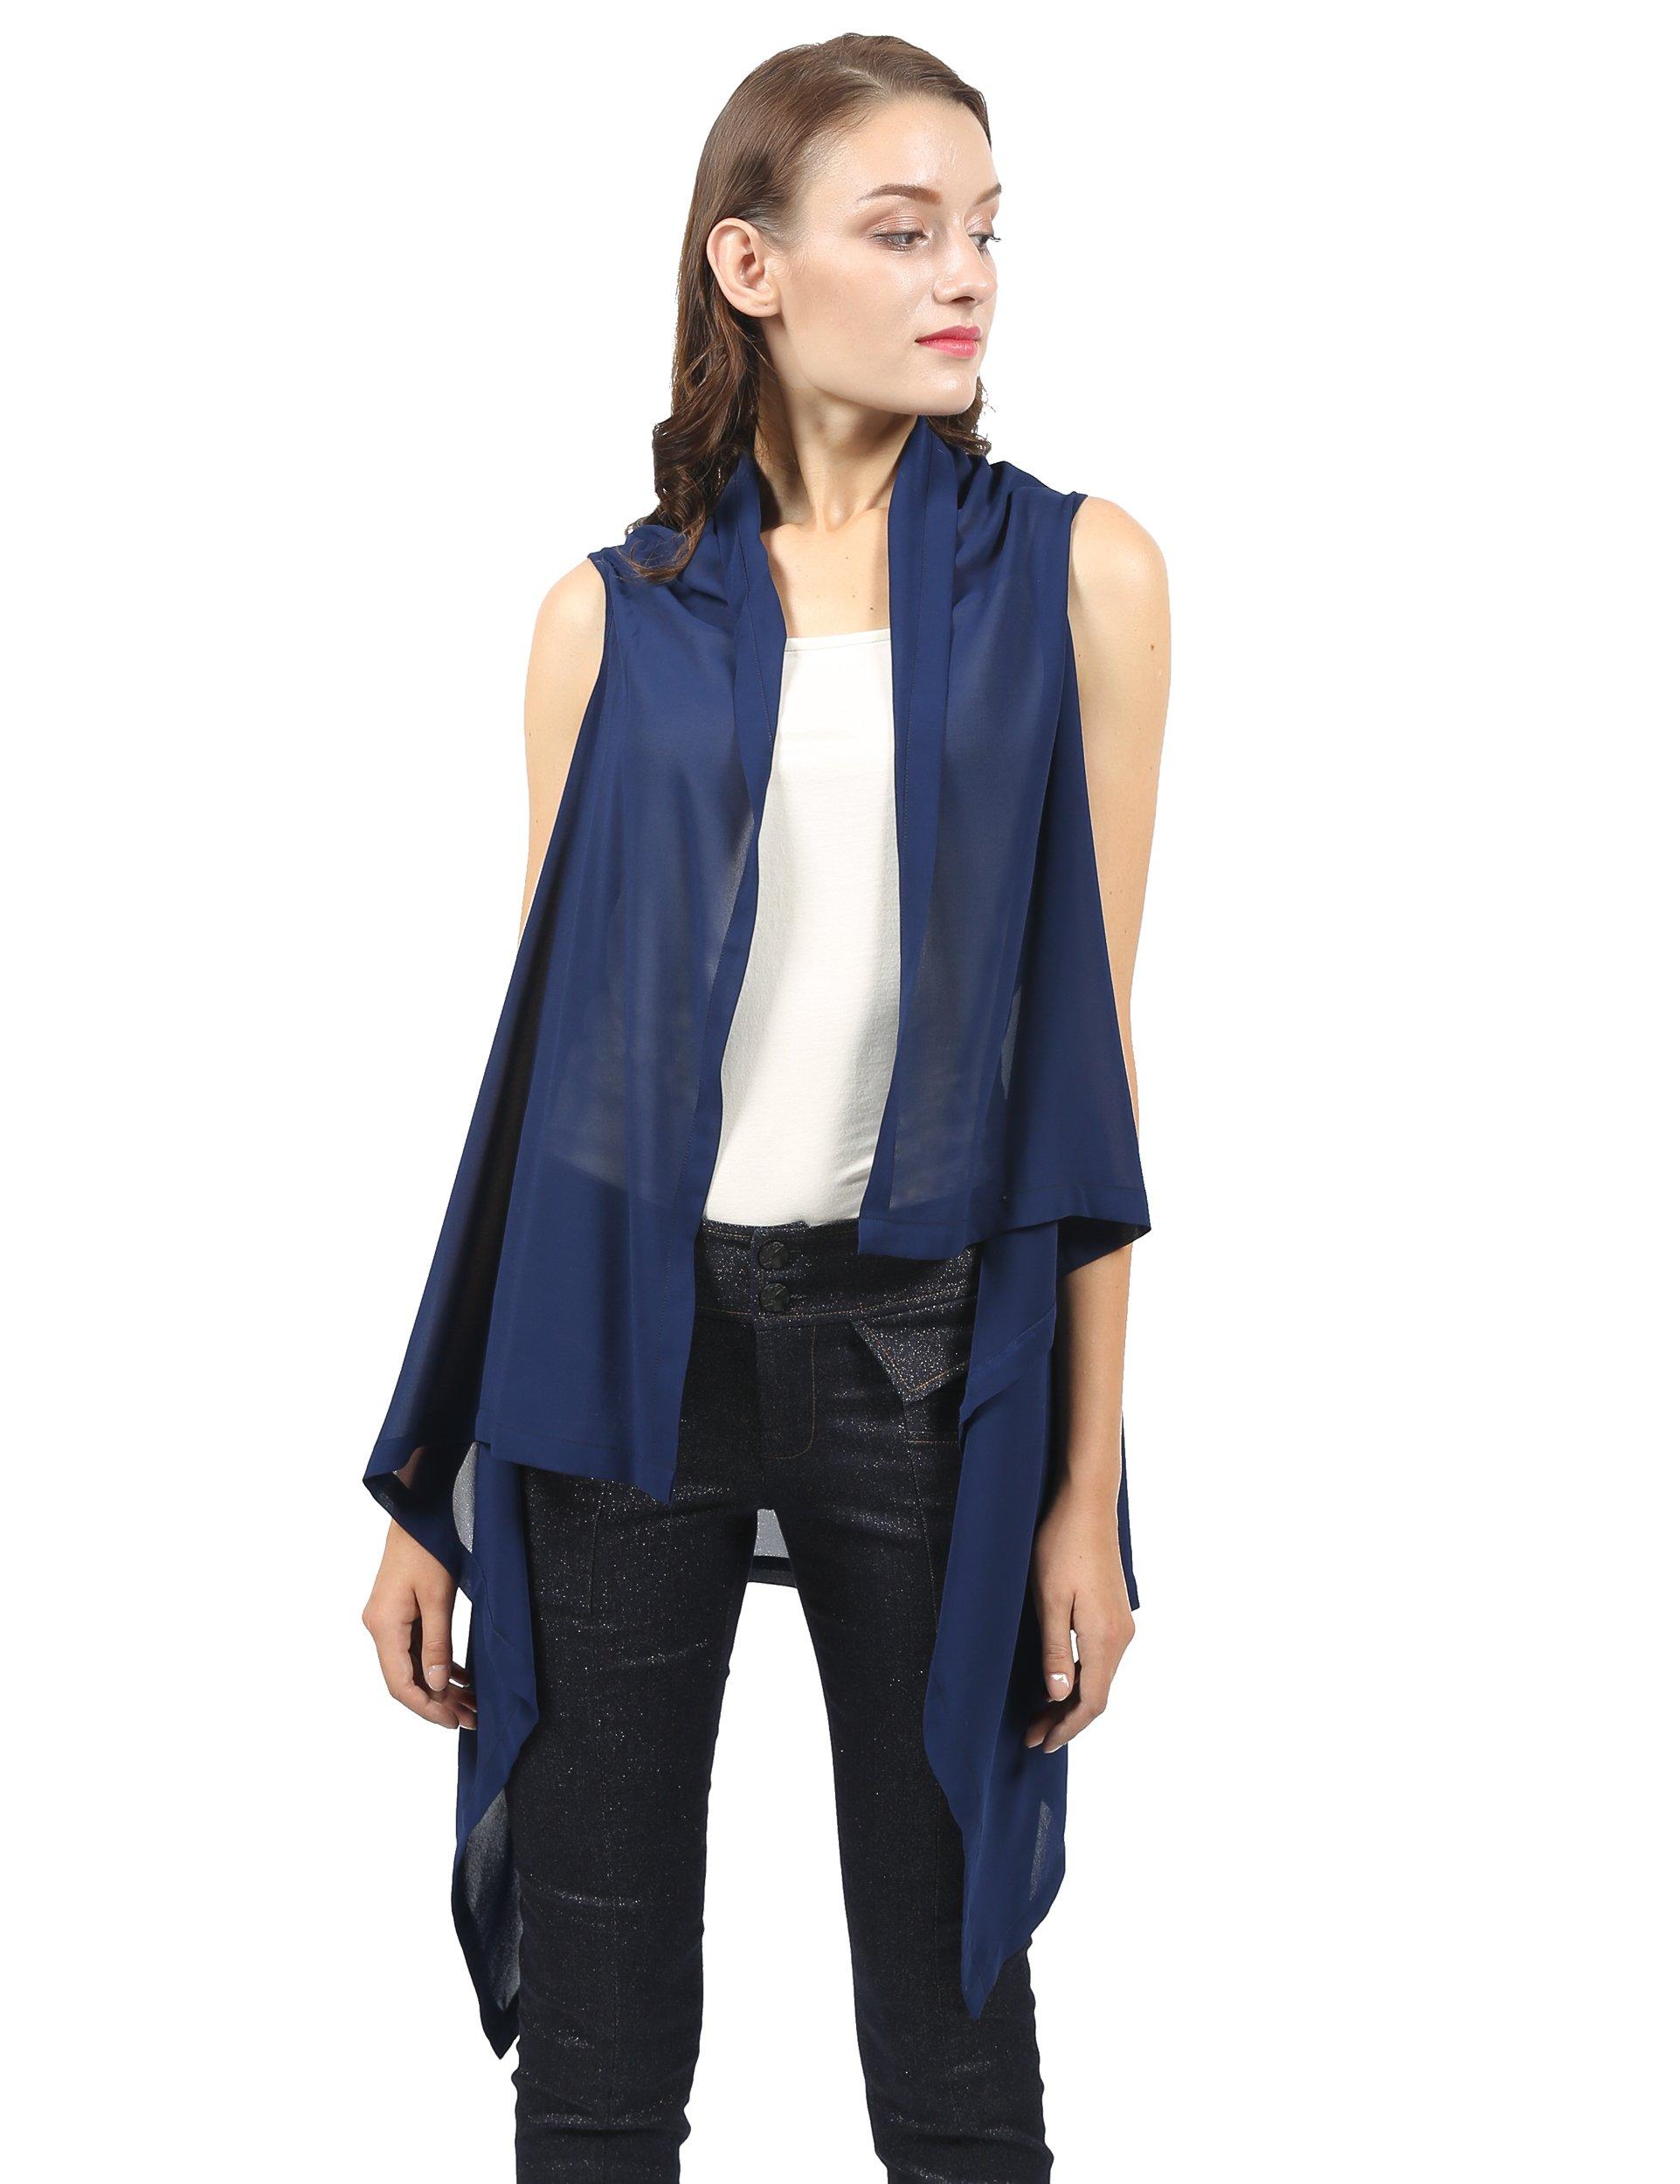 Blue Long Cardigan, Open Front Chiffon Shawl, Women Lightweight Sleeveless Vest